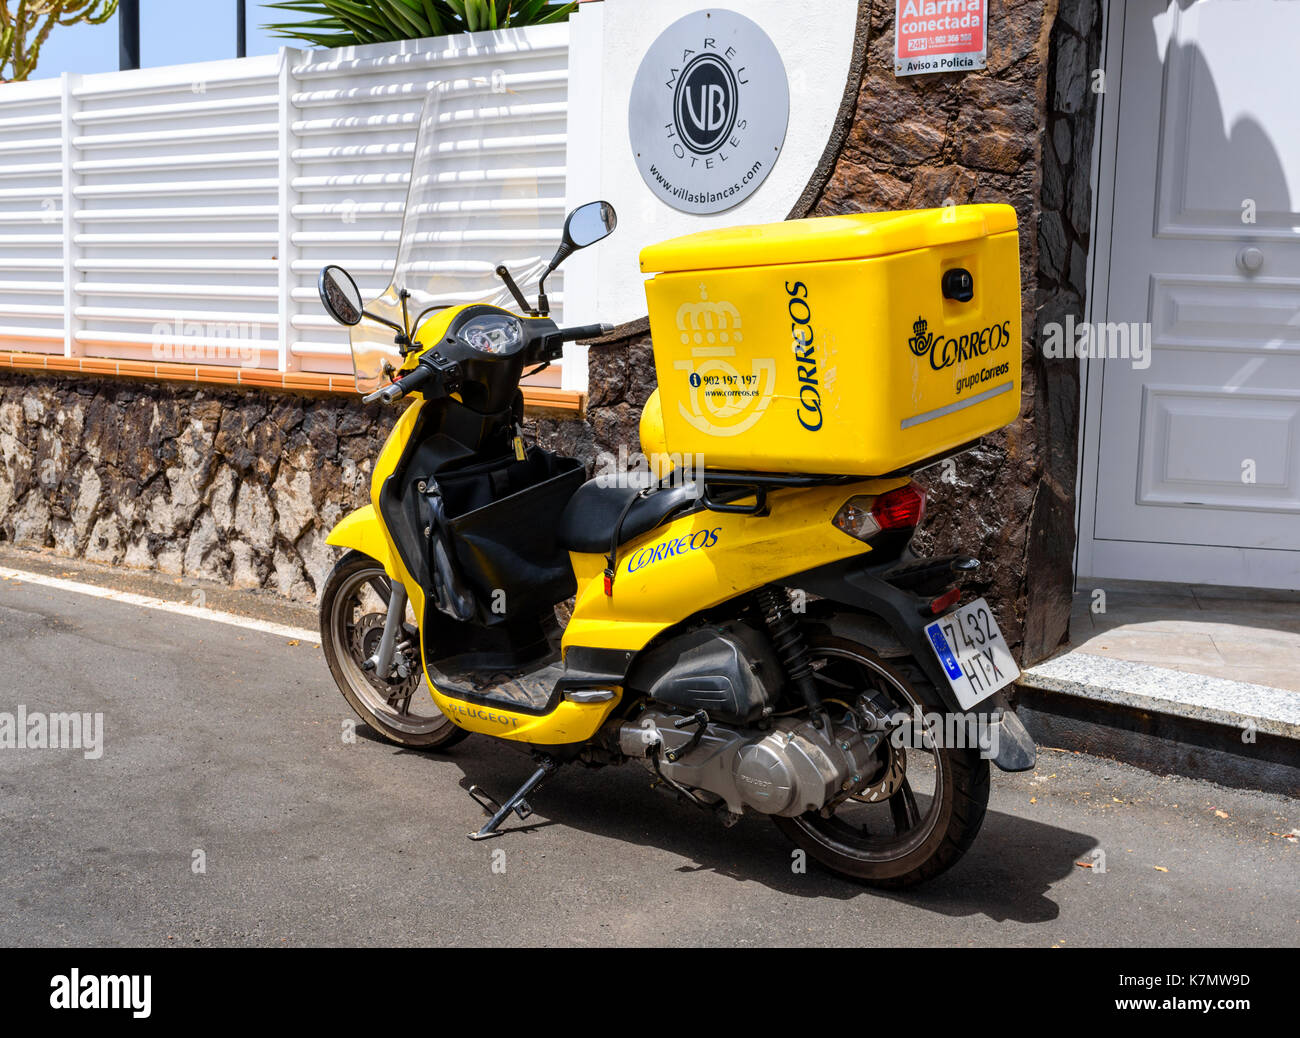 Bike belonging to Correos, the Spanish postal service on Gran Canaria, Spain - Stock Image